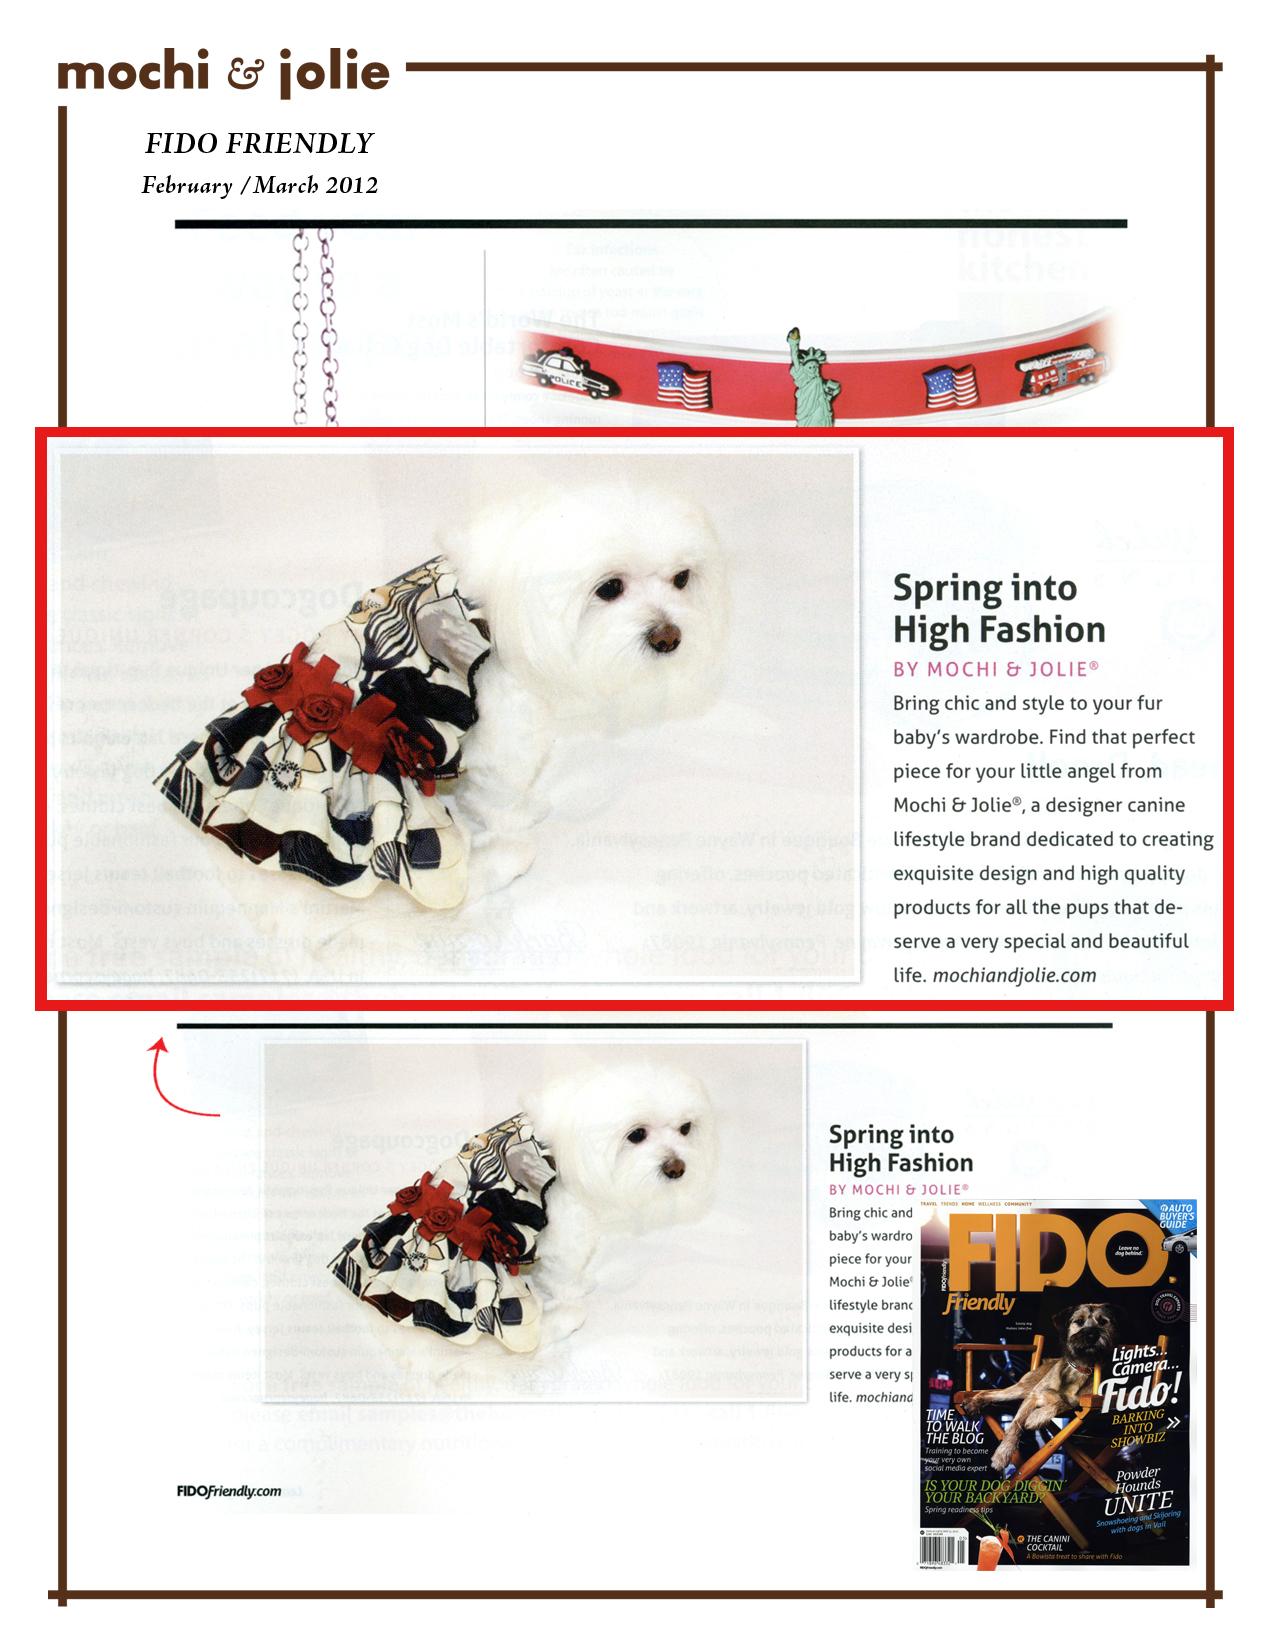 Fido Friendly (issue 53, February/March 2012)